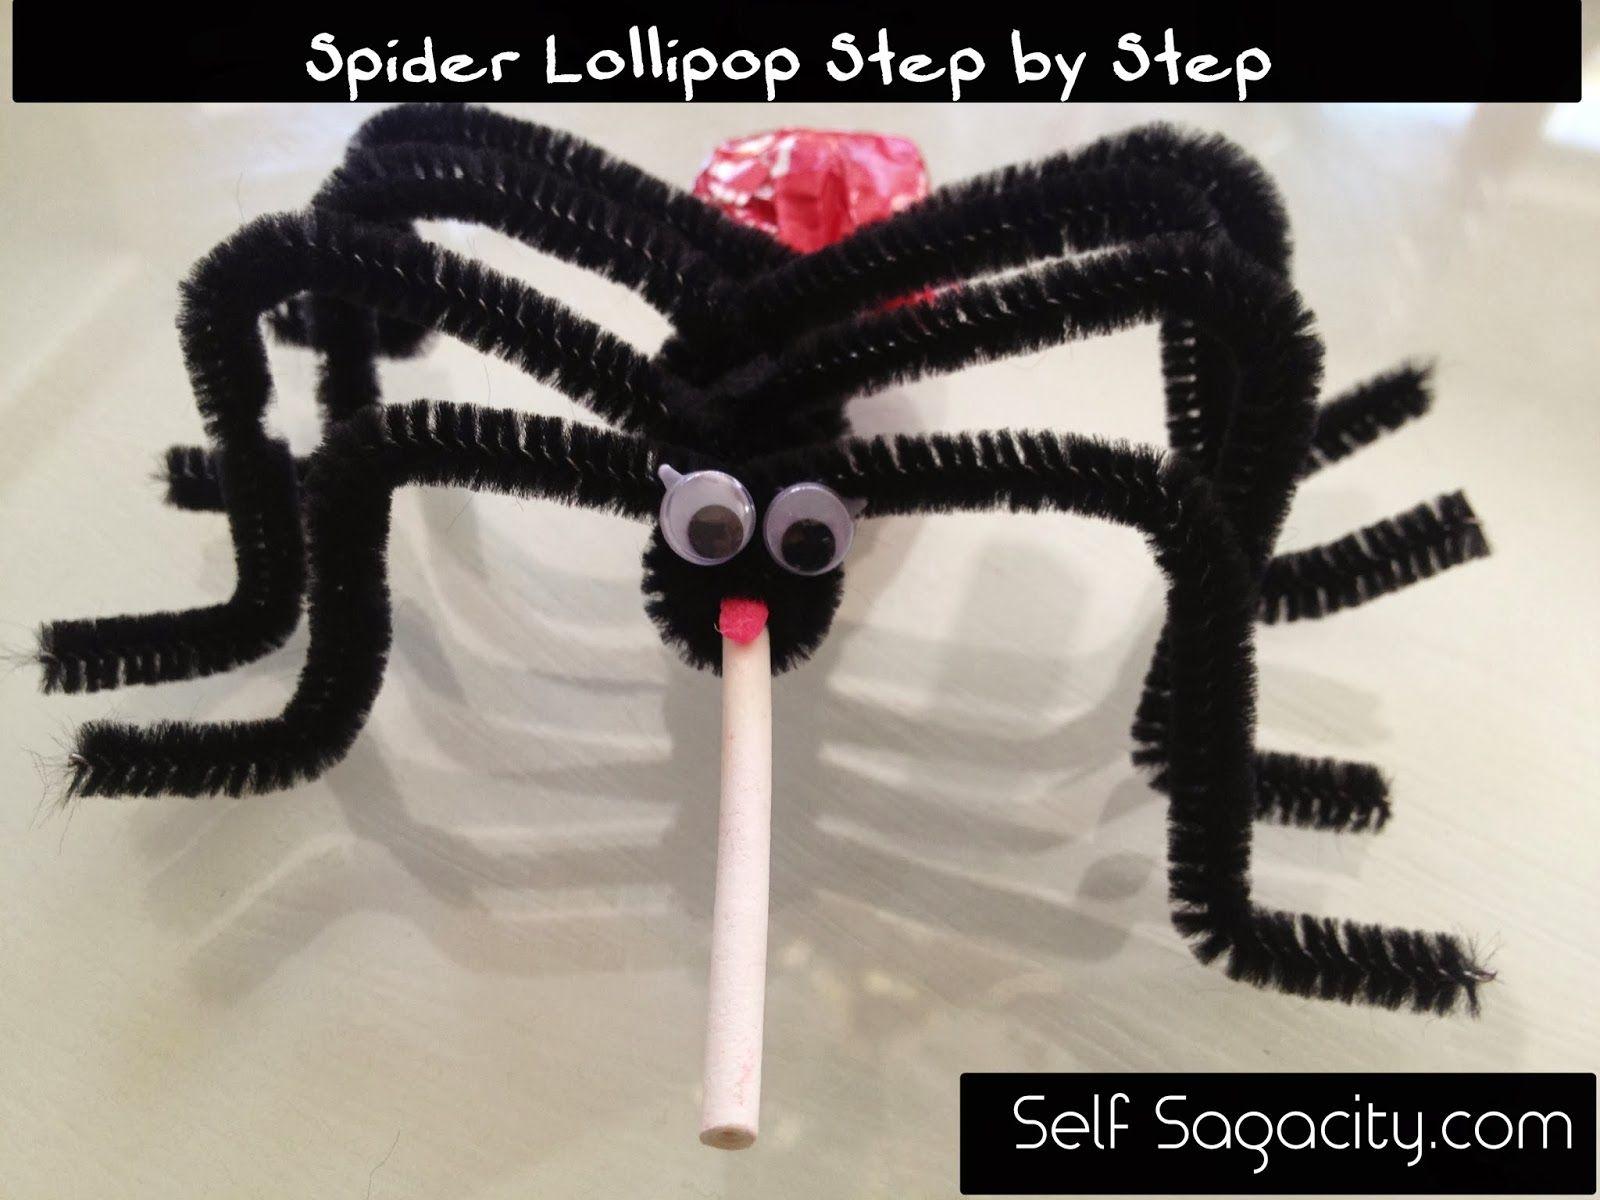 Spider Lollipop Halloween Craft Tutorial - Step by Step for kids.